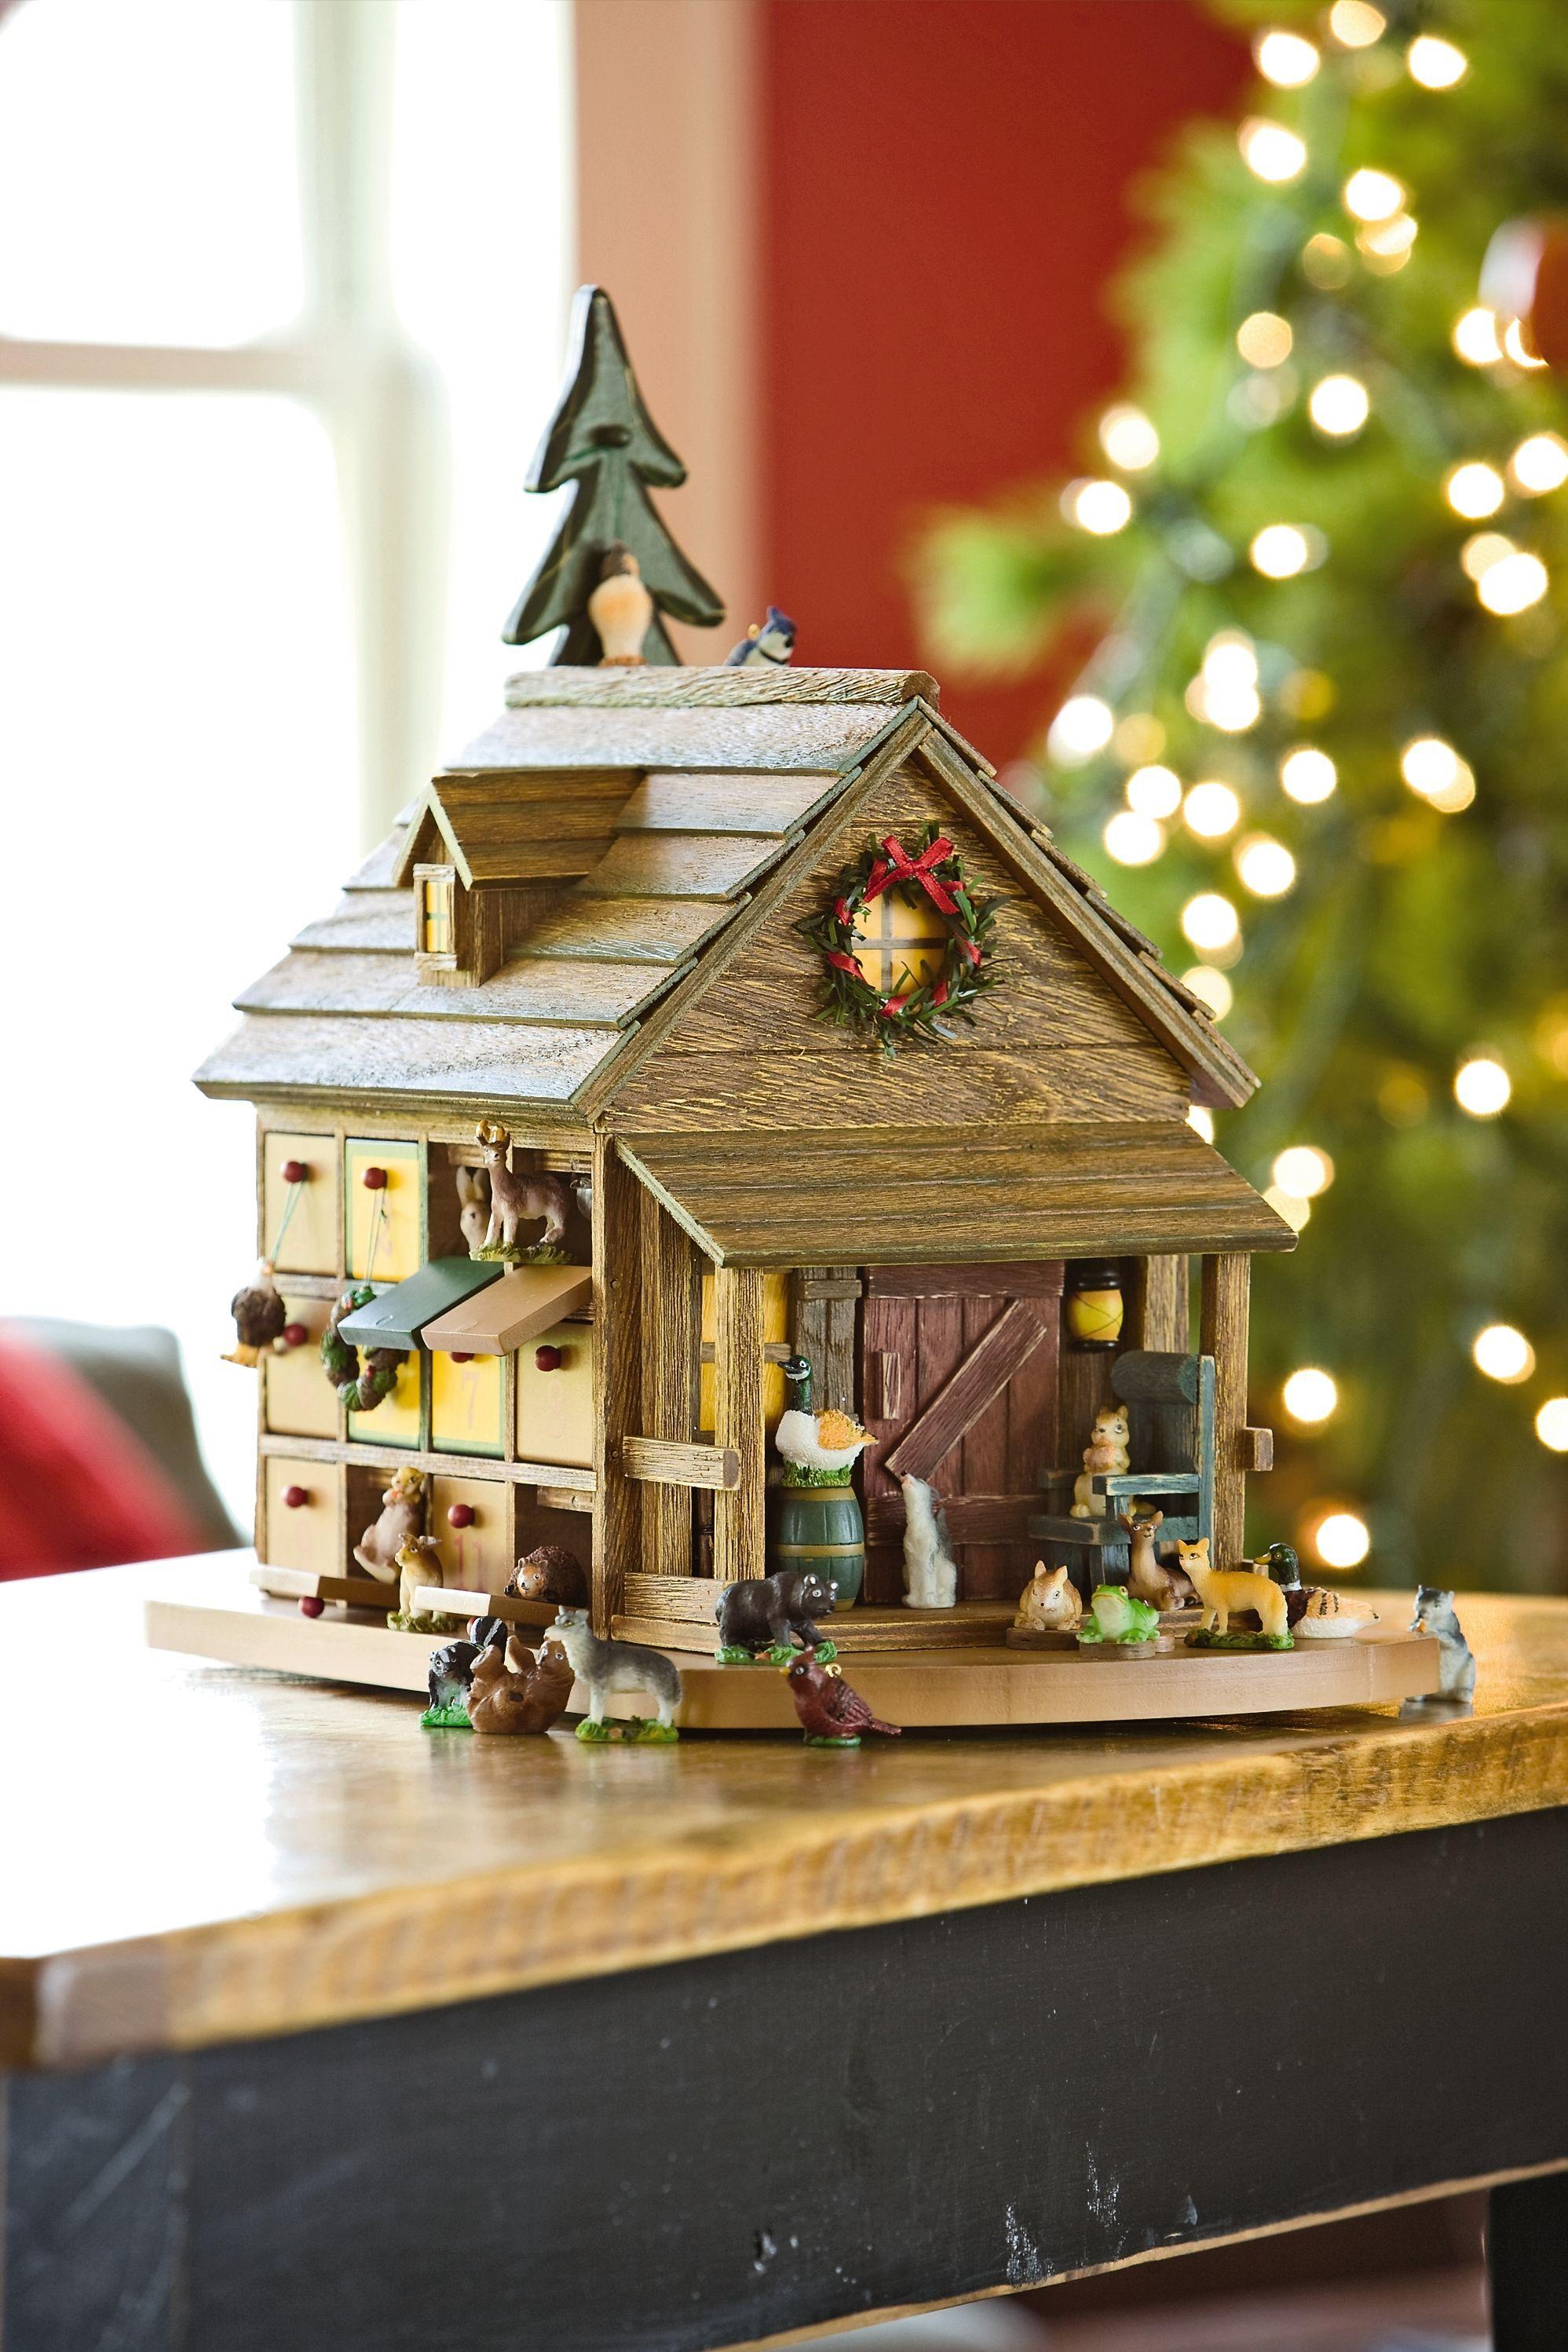 3946d43709788eece362834c827190f8 - Holland Gardens Christmas Open House 2018